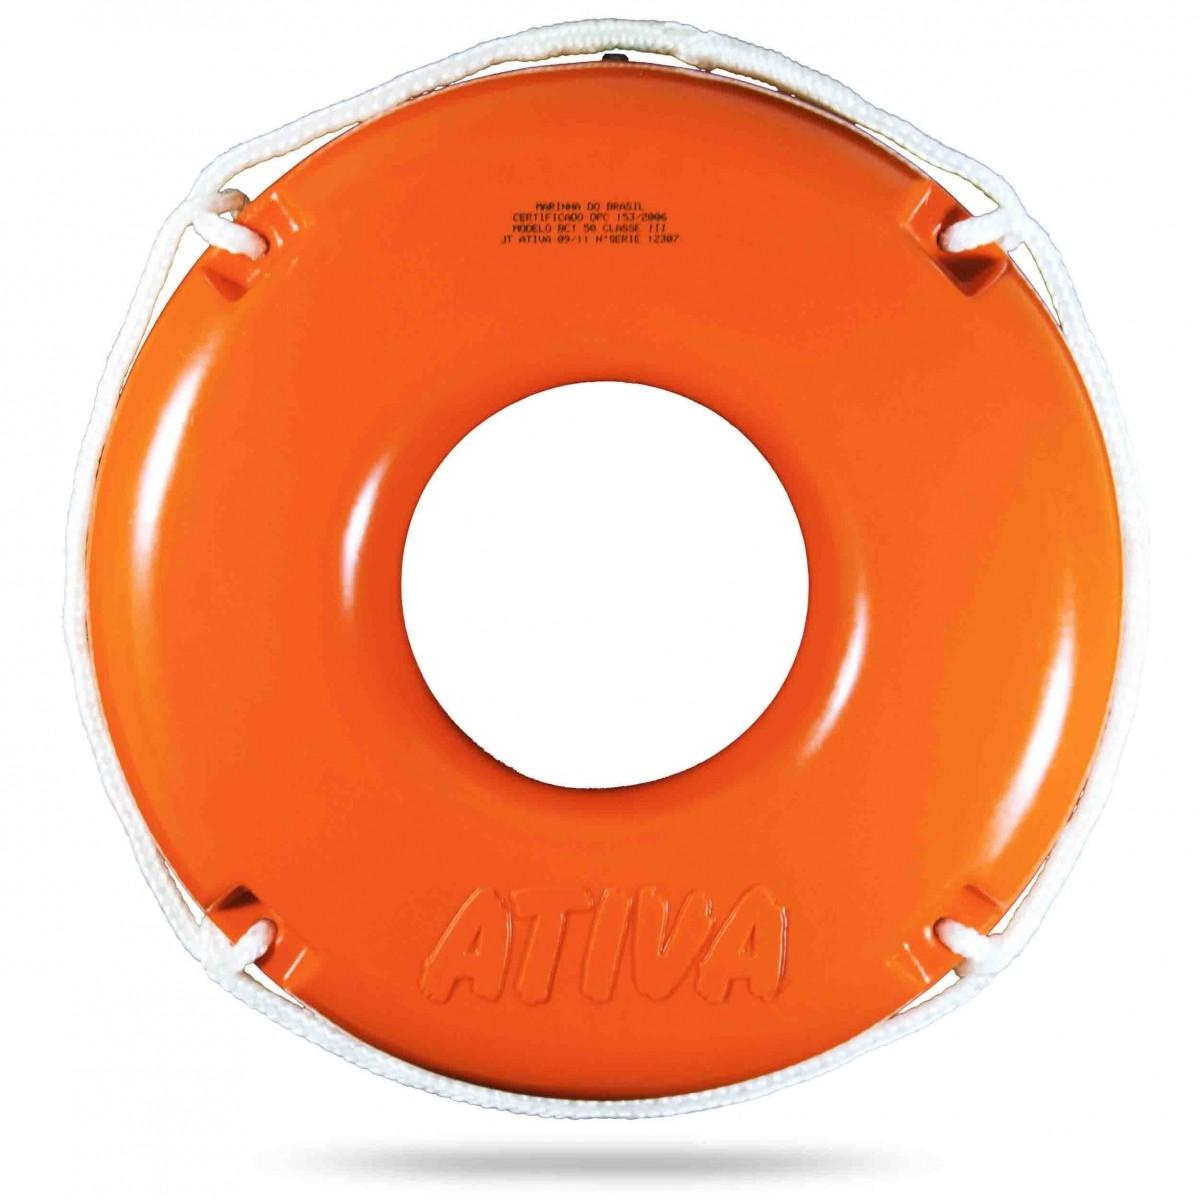 Boia Salva-Vidas Classe III+  - Radical Peças - Peças para Jet Ski